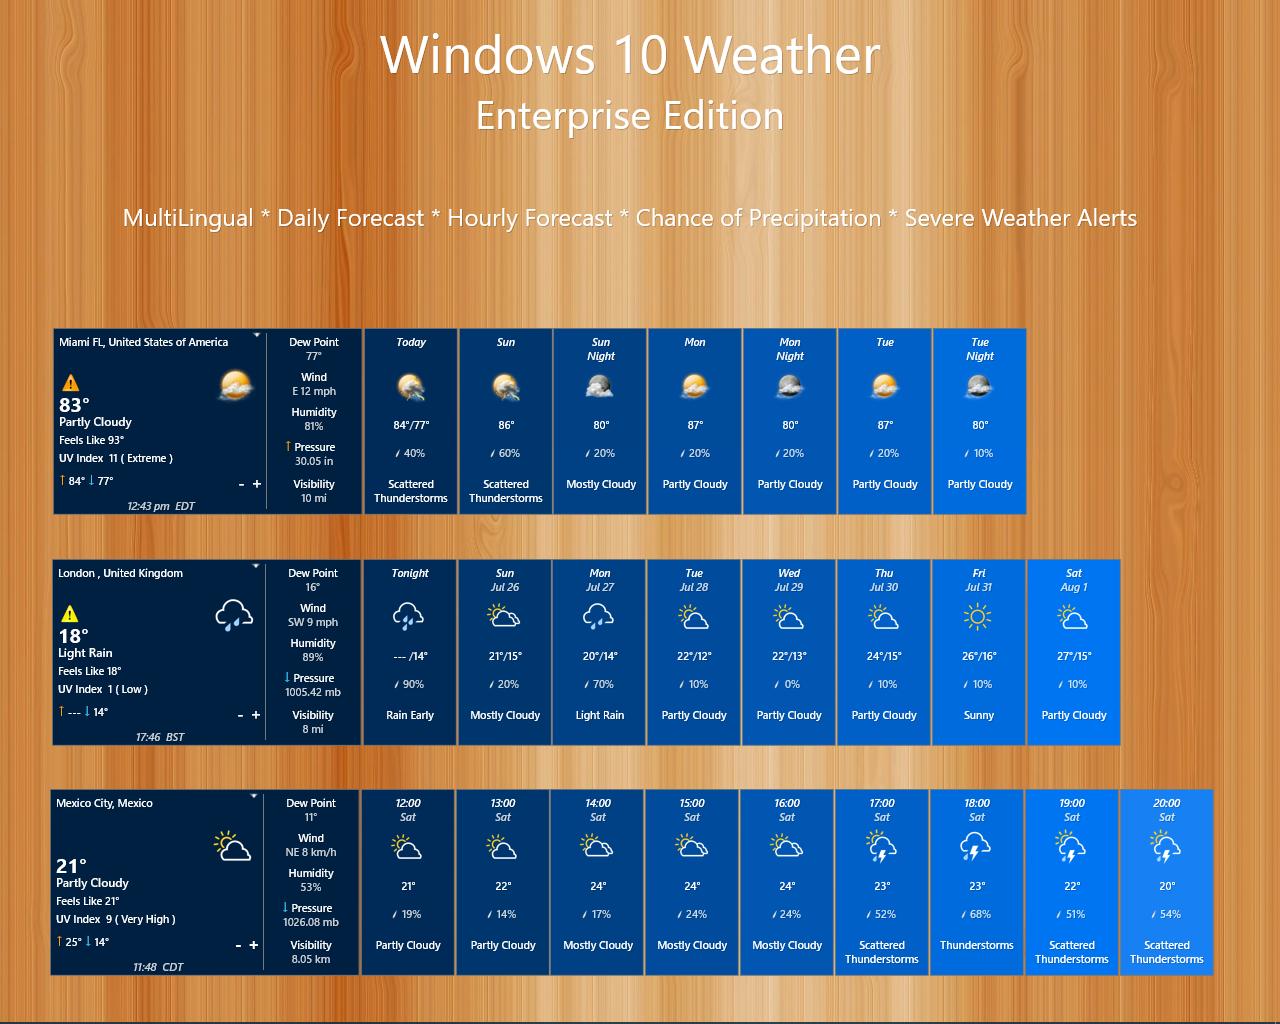 Windows 10 Weather Enterprise(UPDATED 2-AUG-2020)